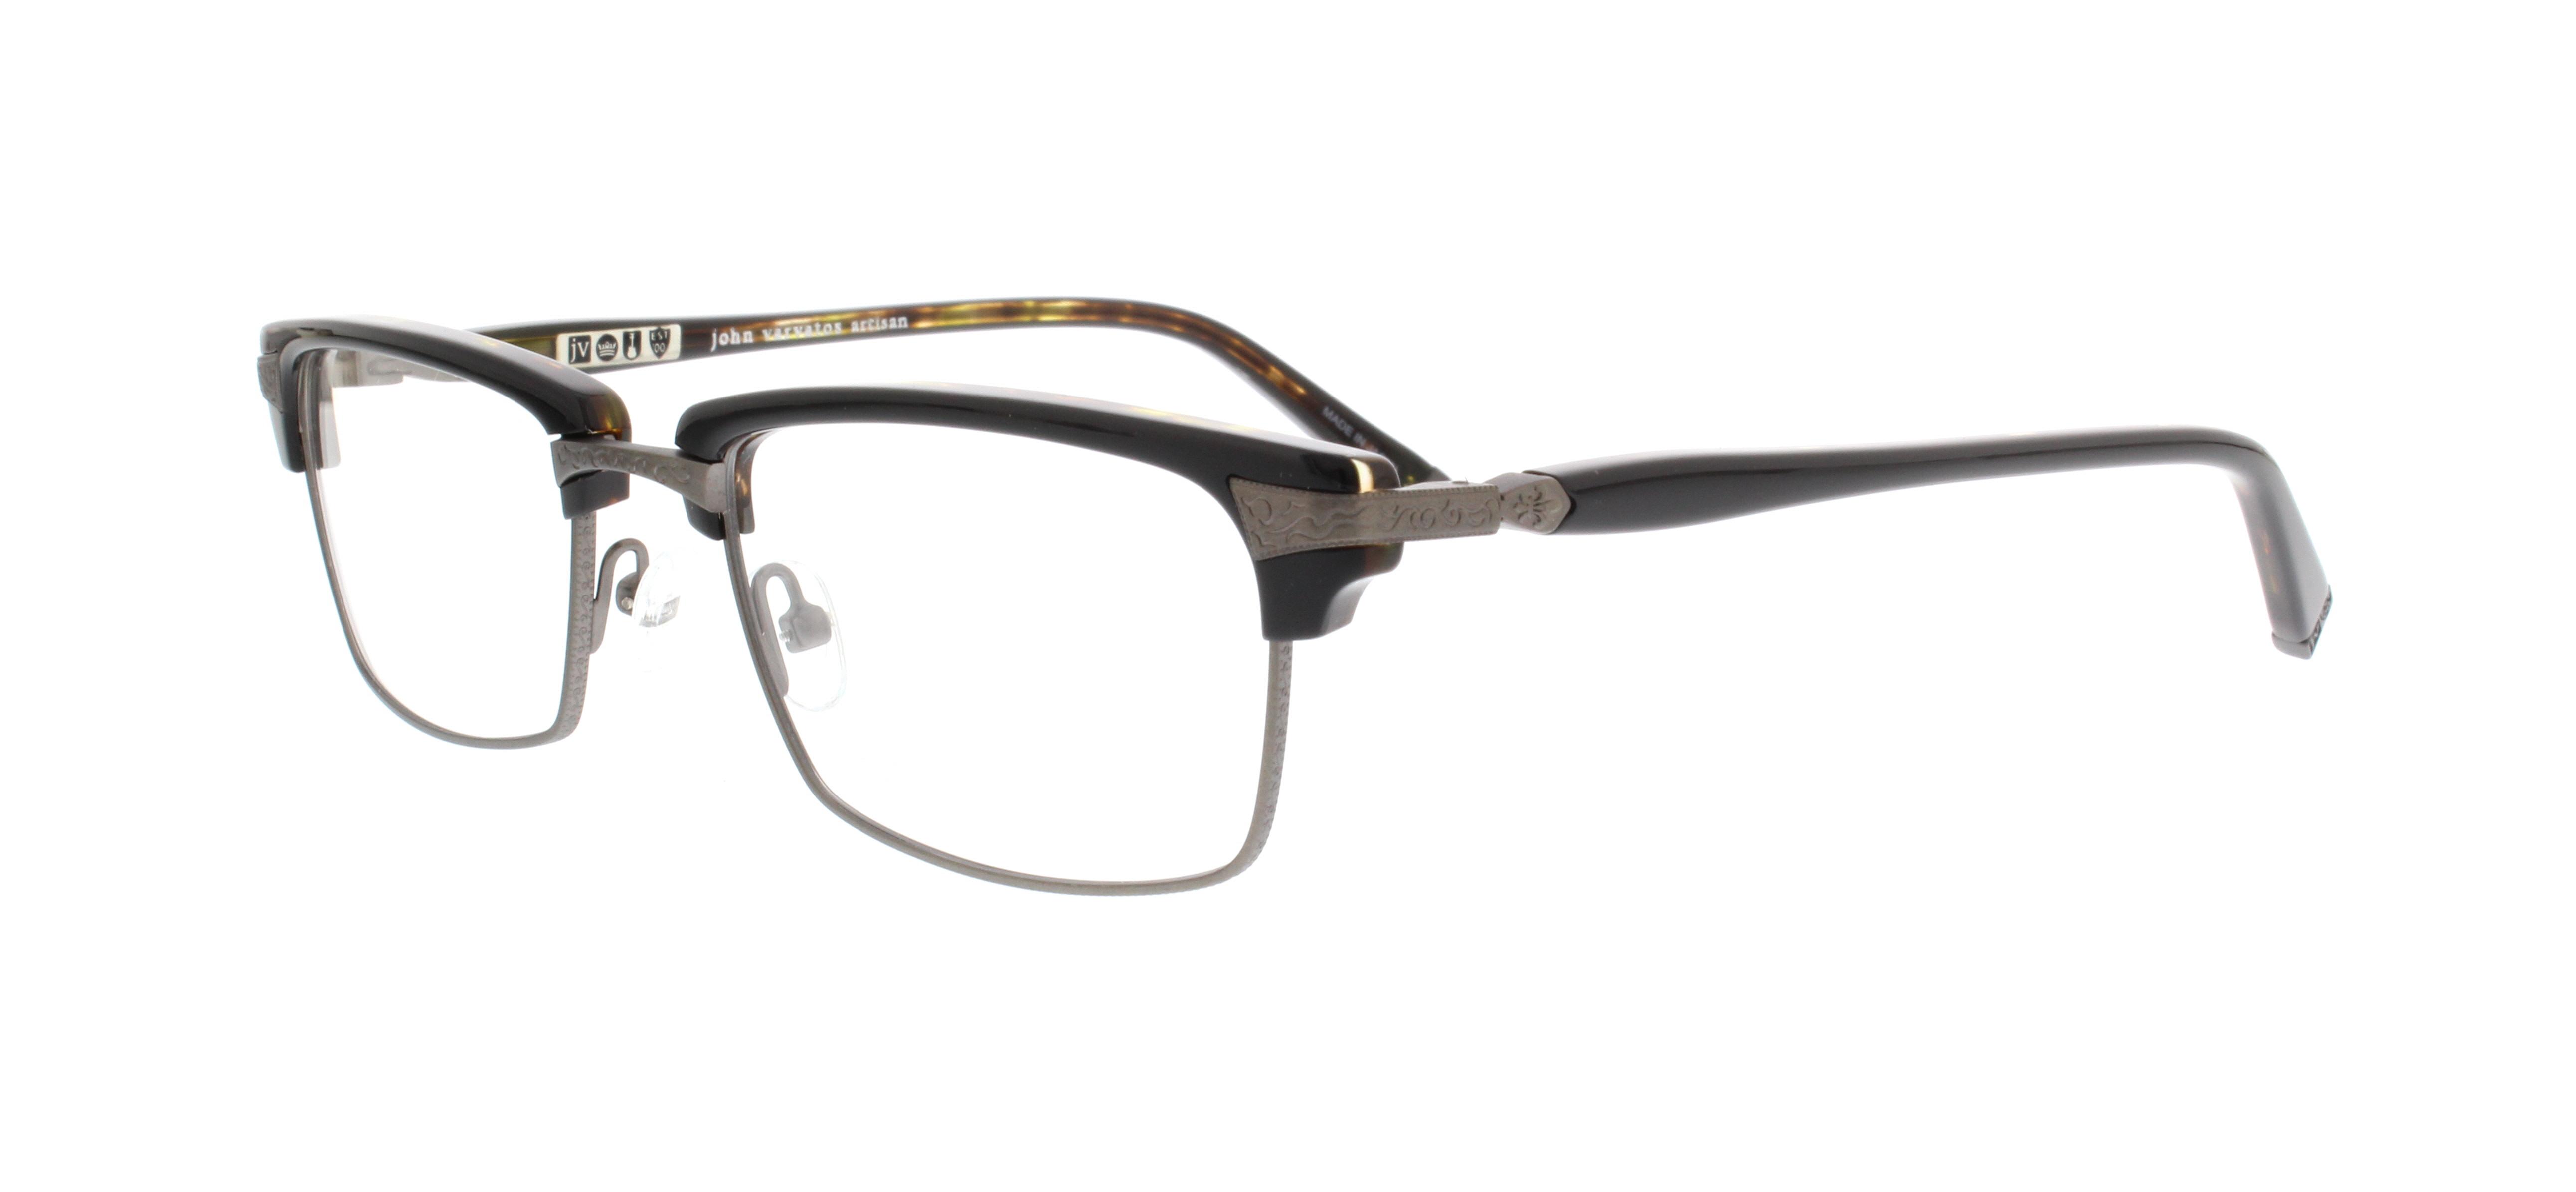 a41b48ffb3 JOHN VARVATOS Eyeglasses V145 Black Tortoise 53MM 751286247053